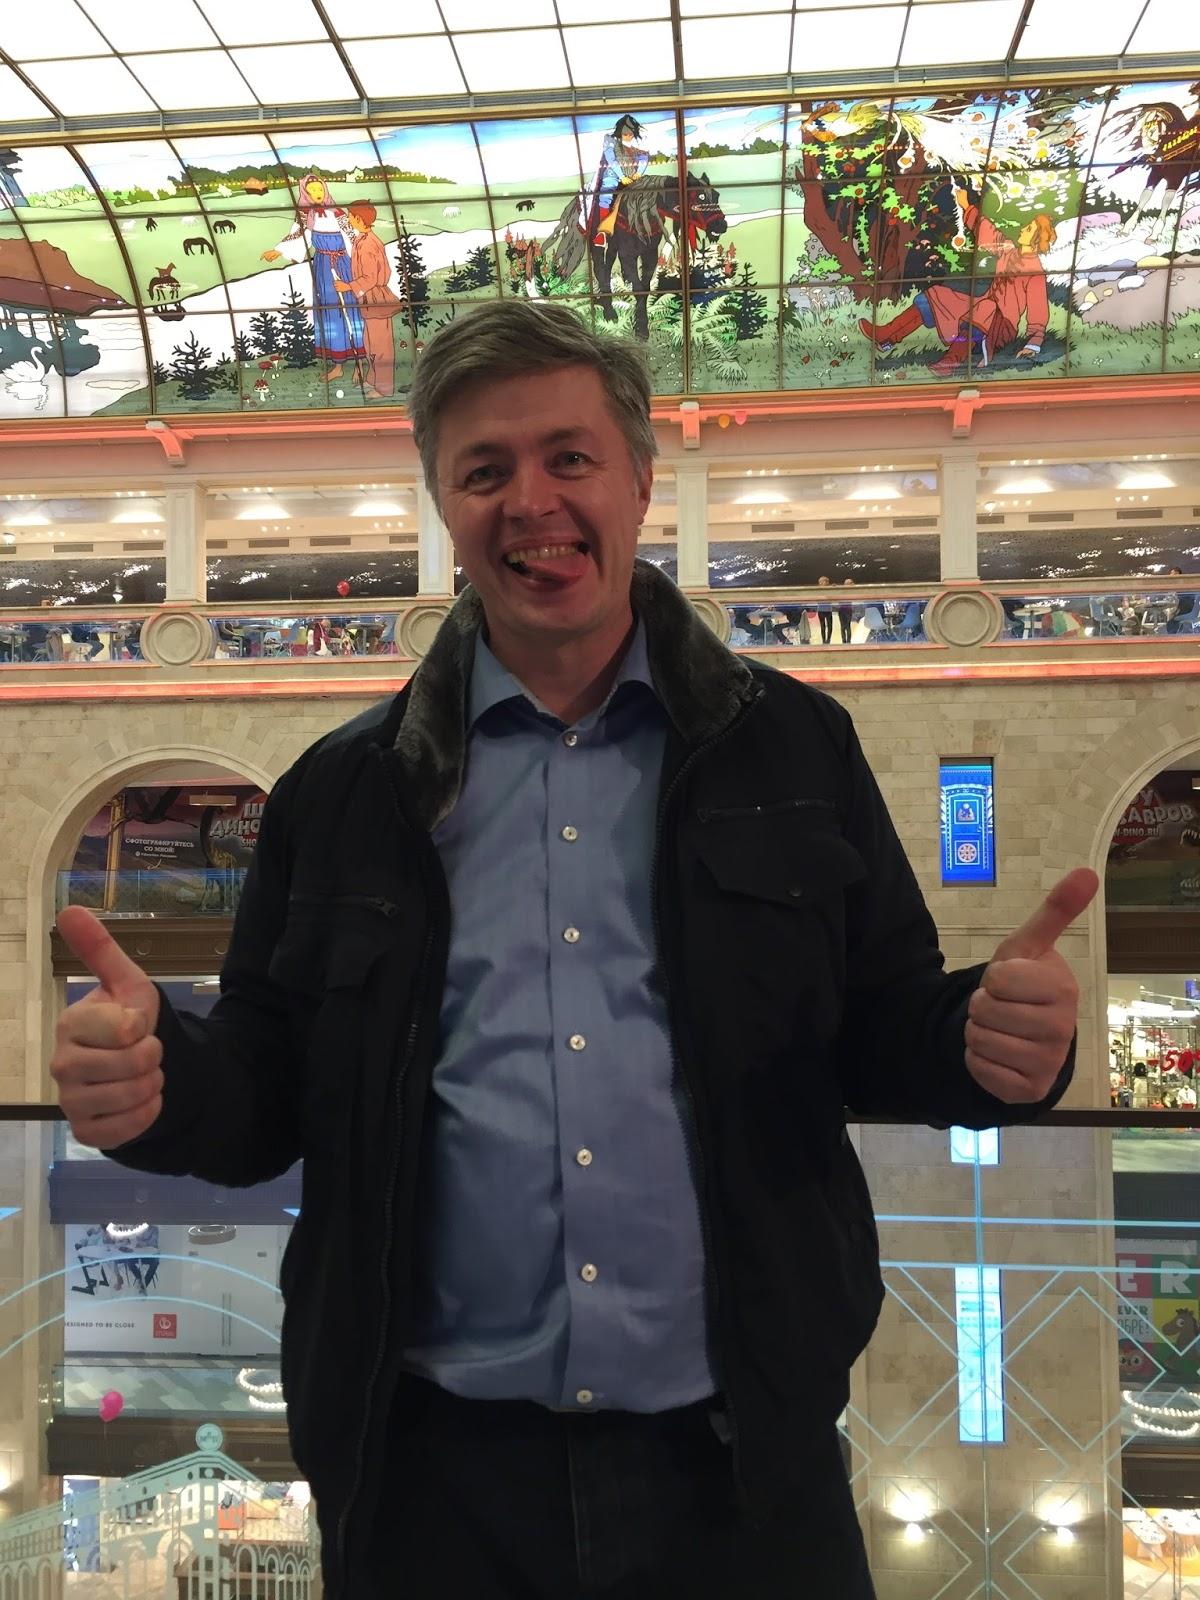 тренинг-семинар Вячеслав Перунов, ученик Влада Клевцова